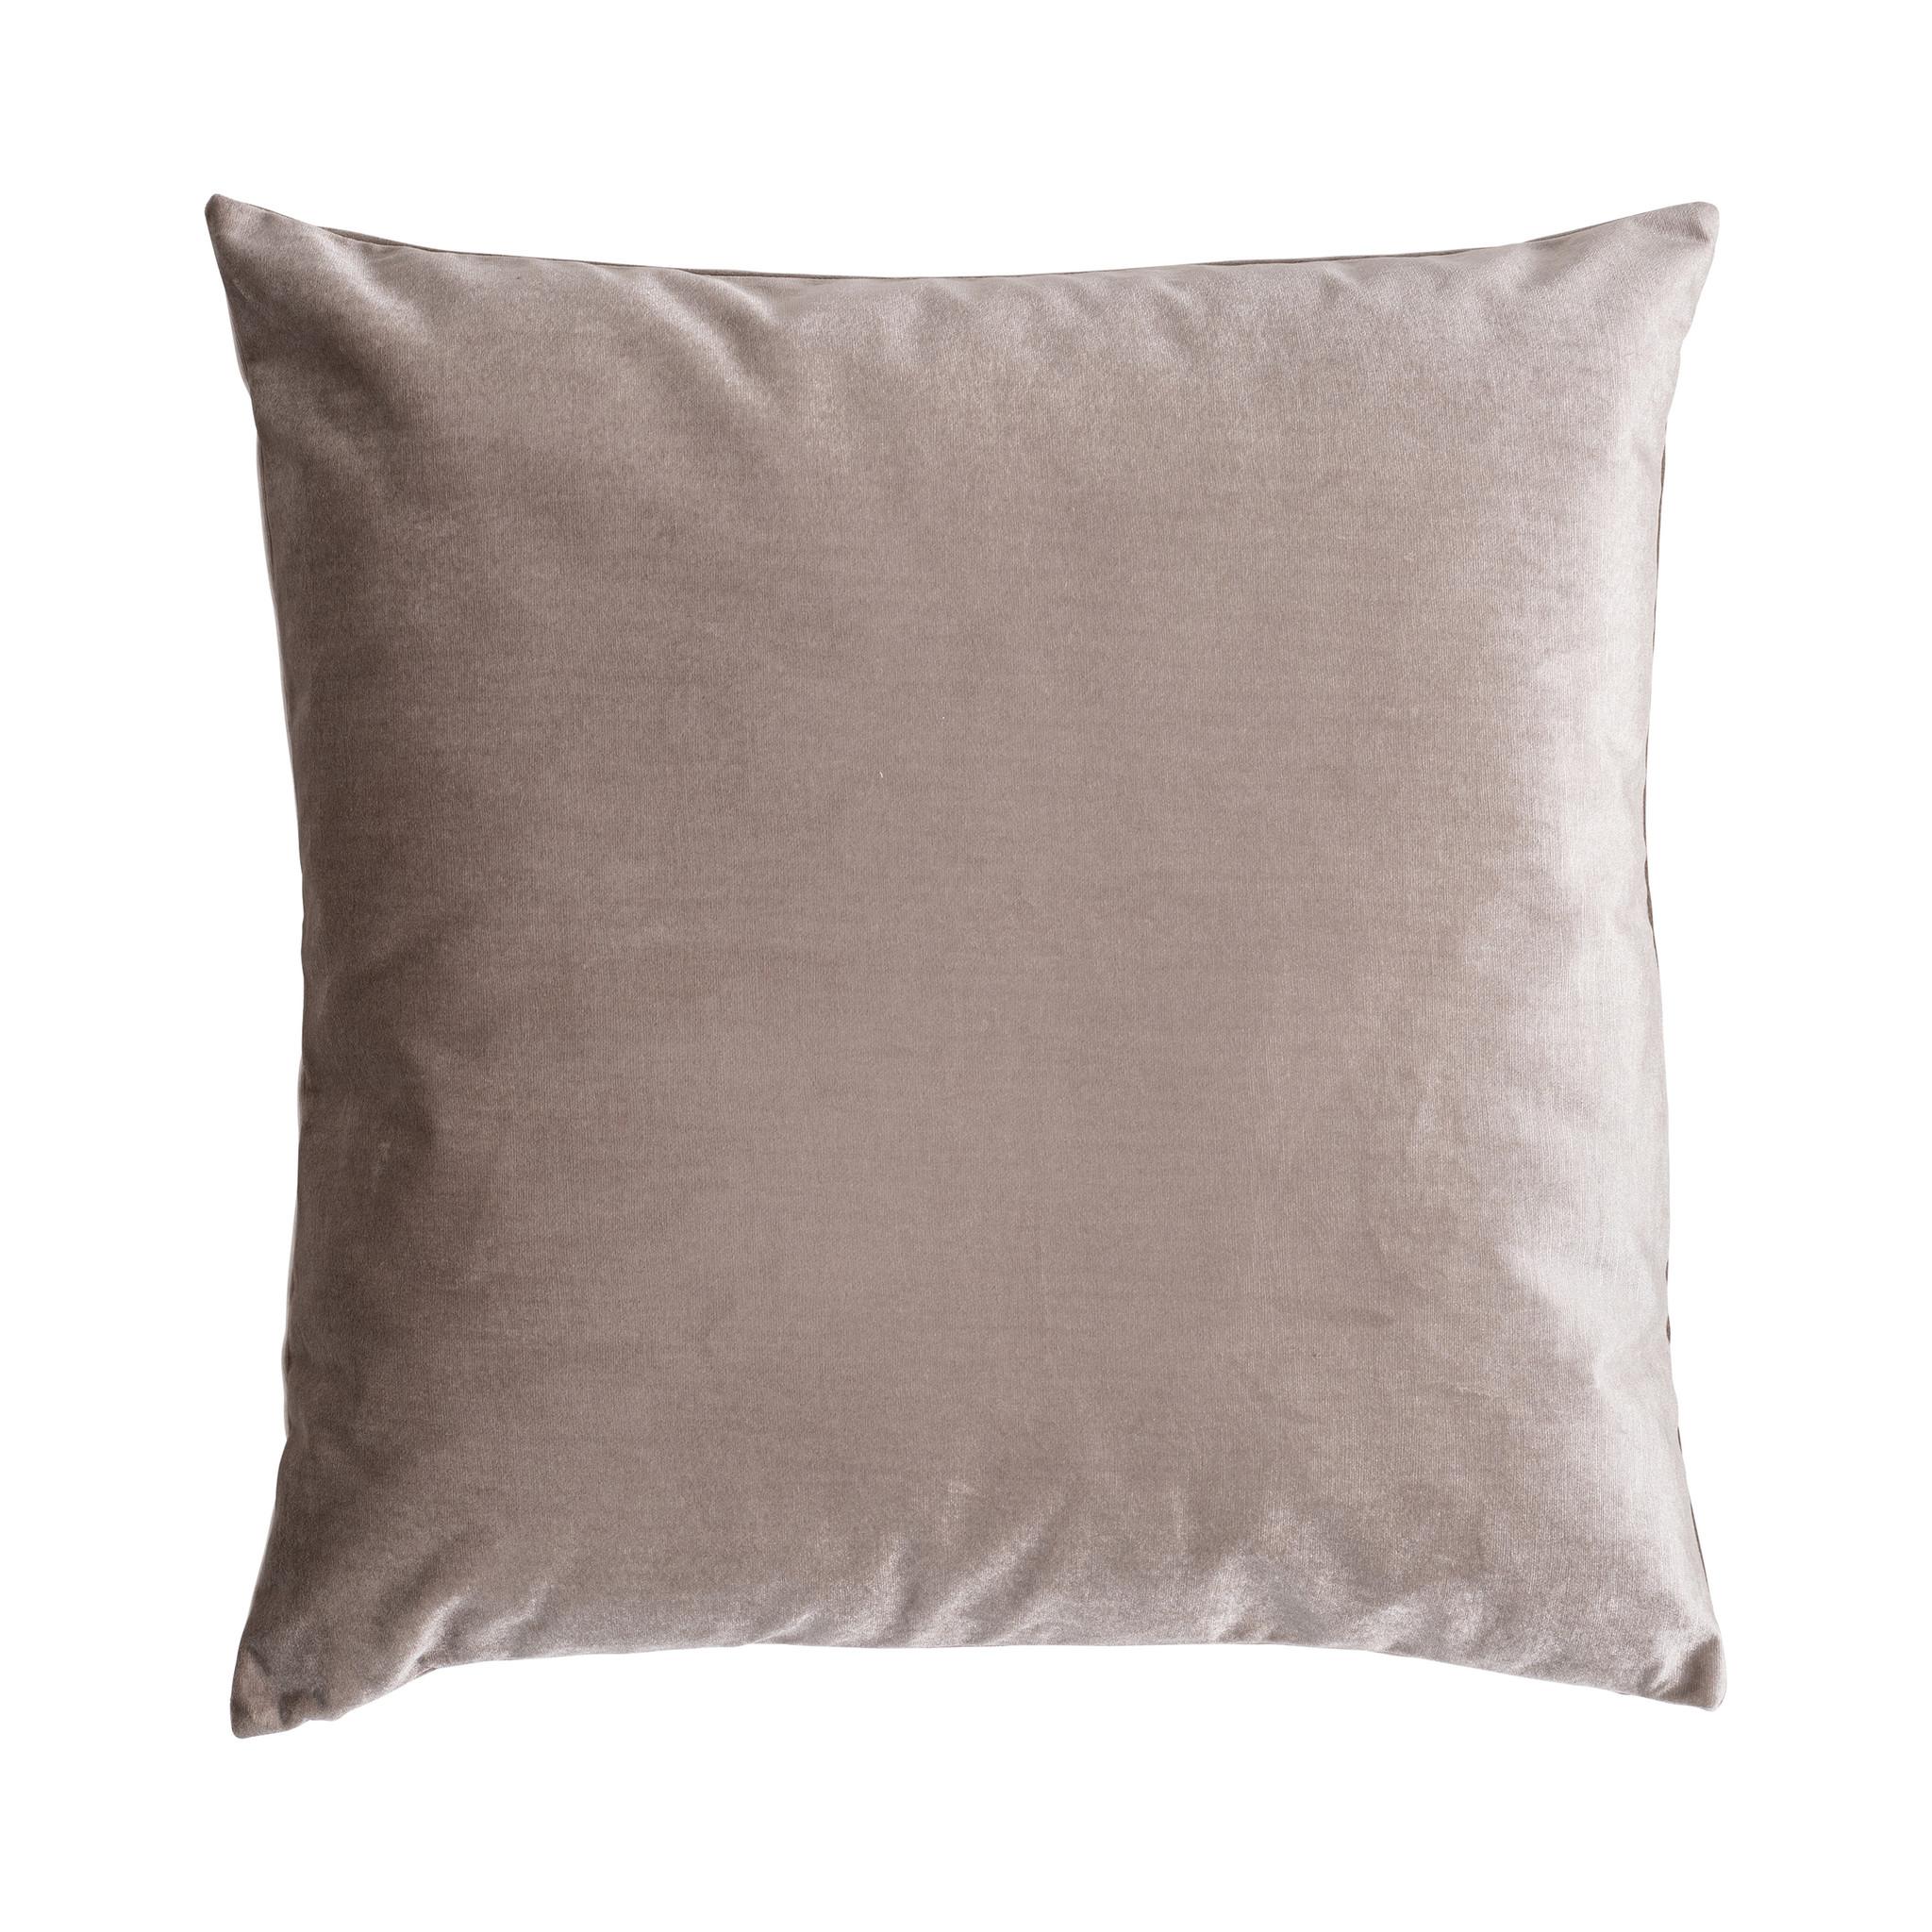 Presence Sierkussenhoes Nola - Warm grijs 30 x 50 cm